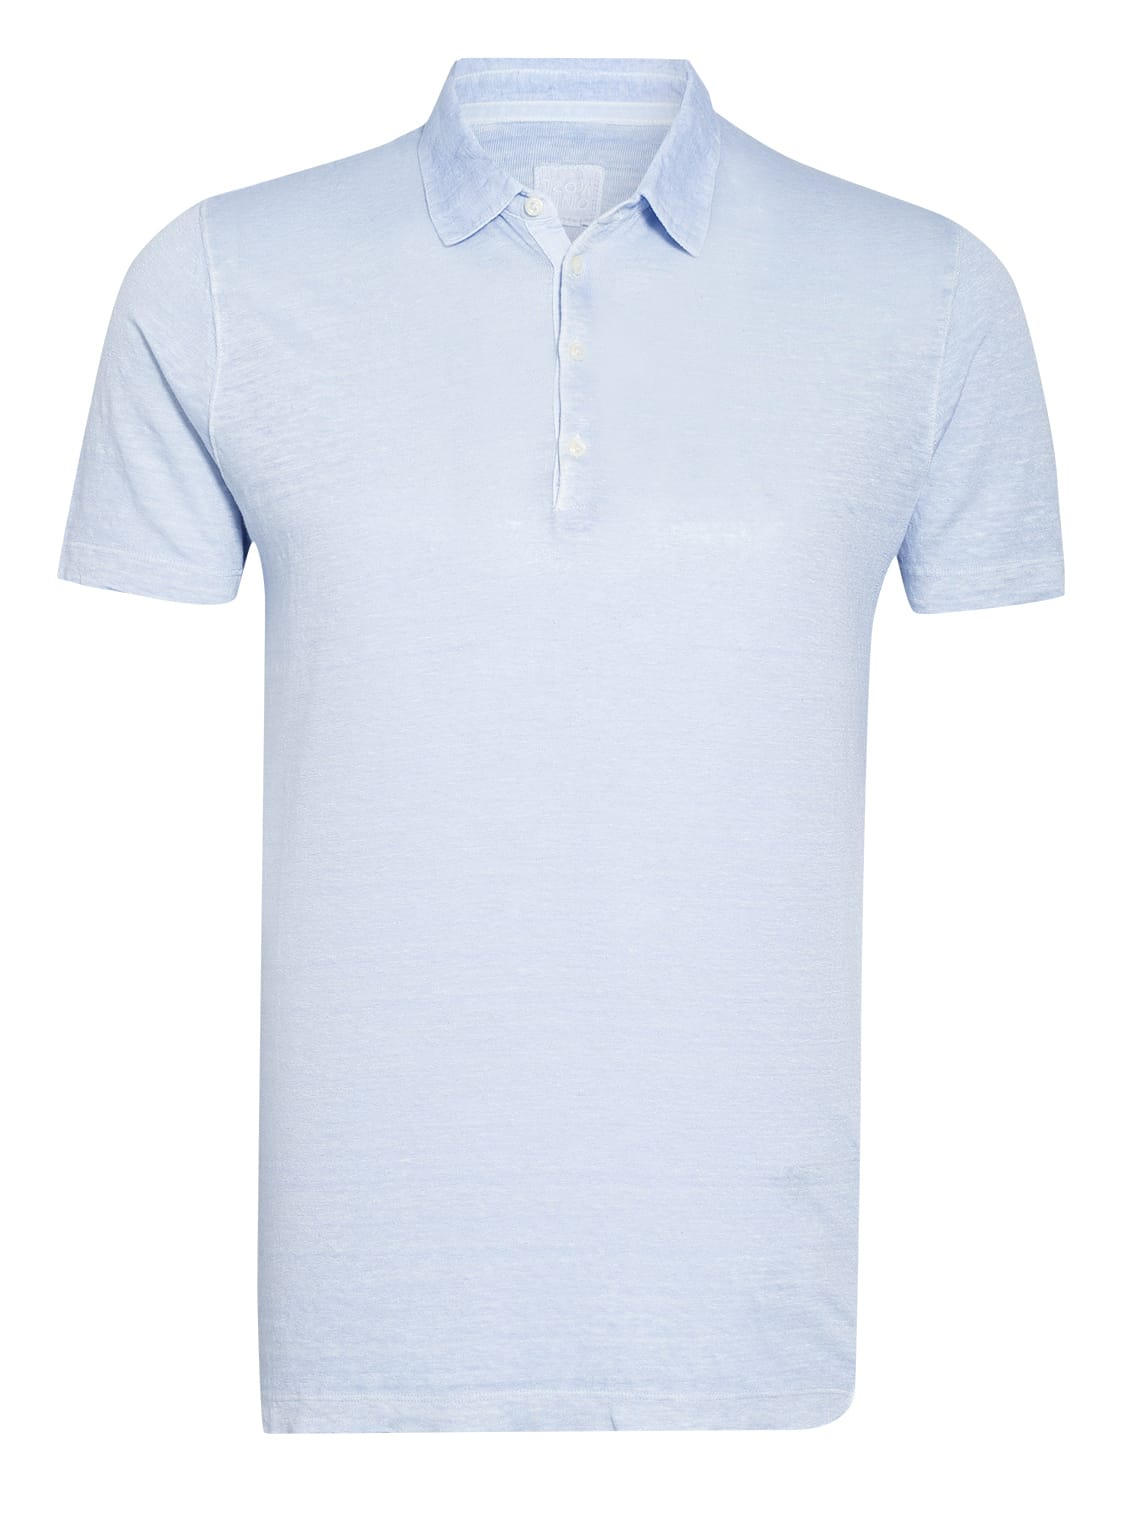 Image of 120%Lino Jersey-Poloshirt Slim Fit Aus Leinen blau